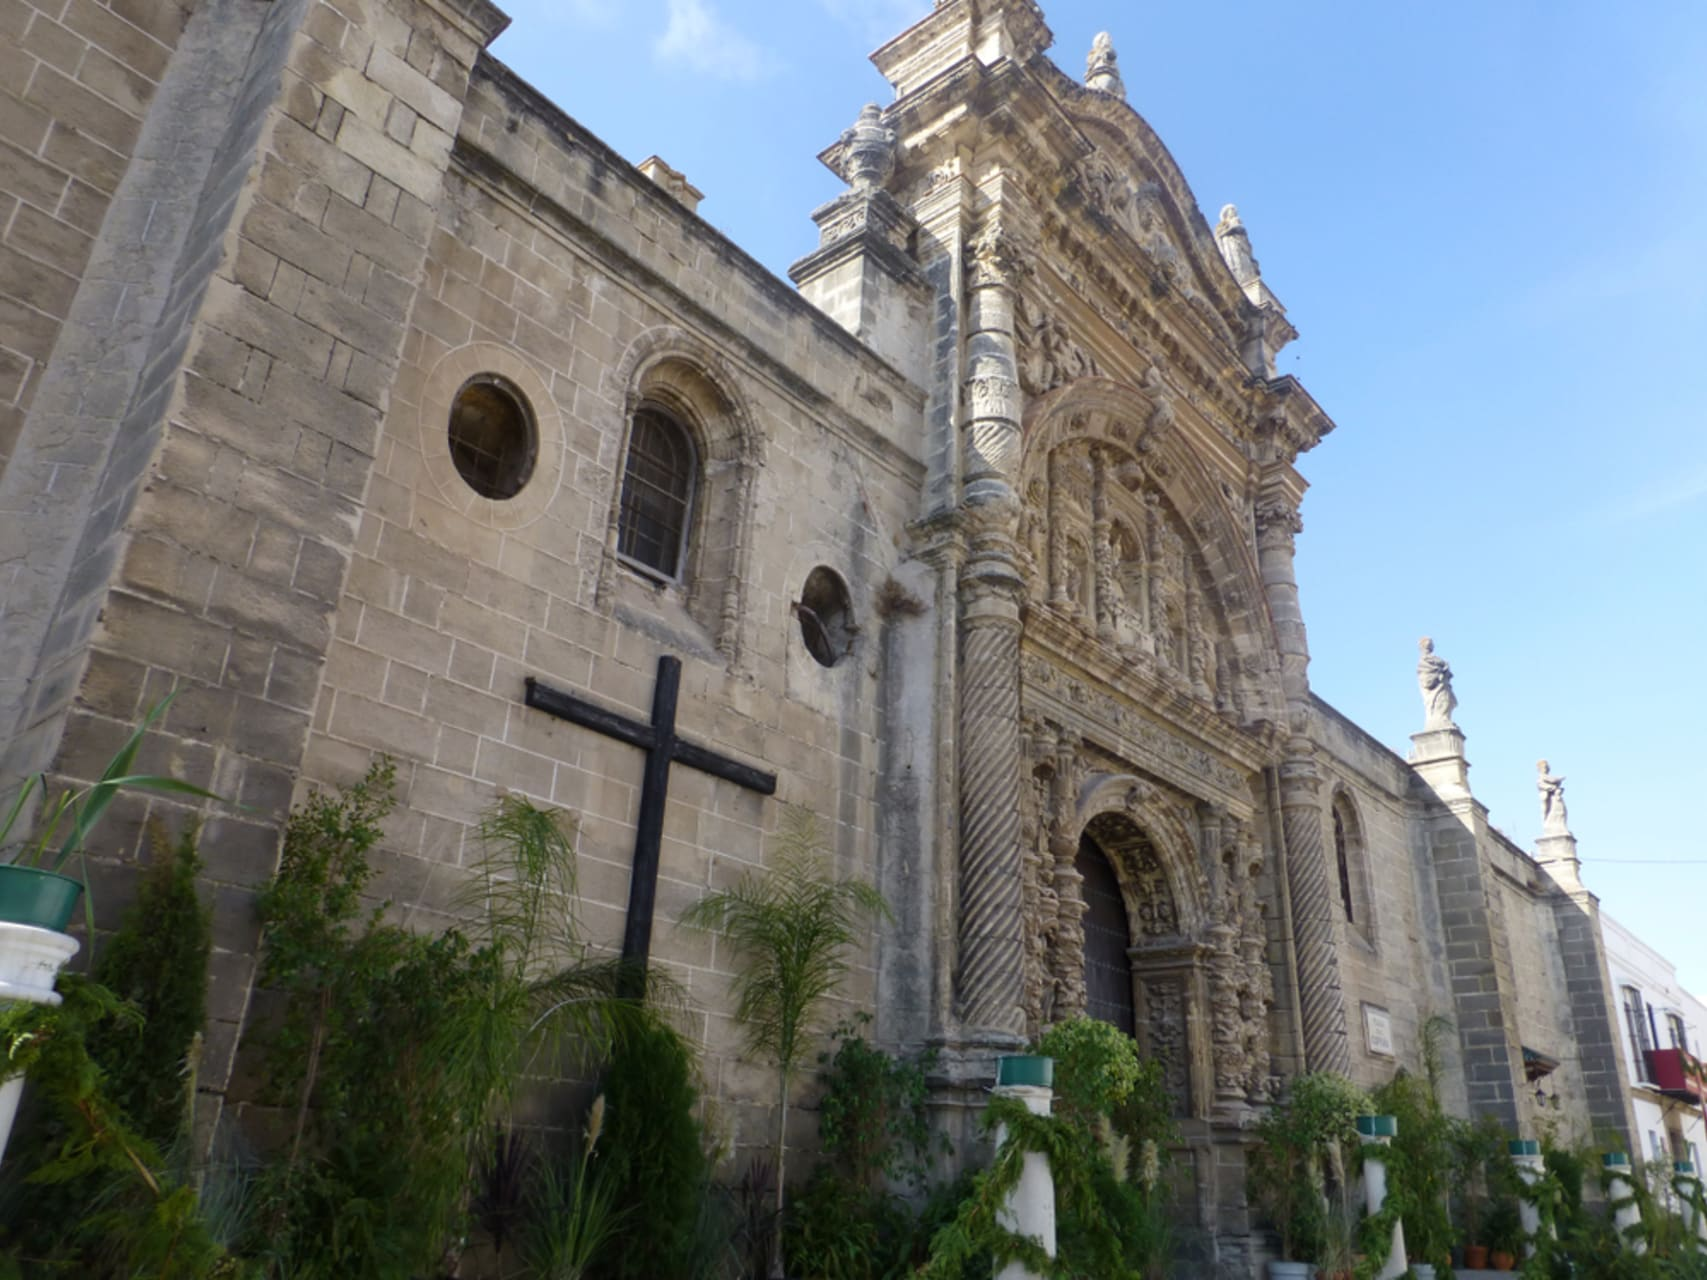 Cádiz - The city of the 100 palaces, Puerto de Santa María